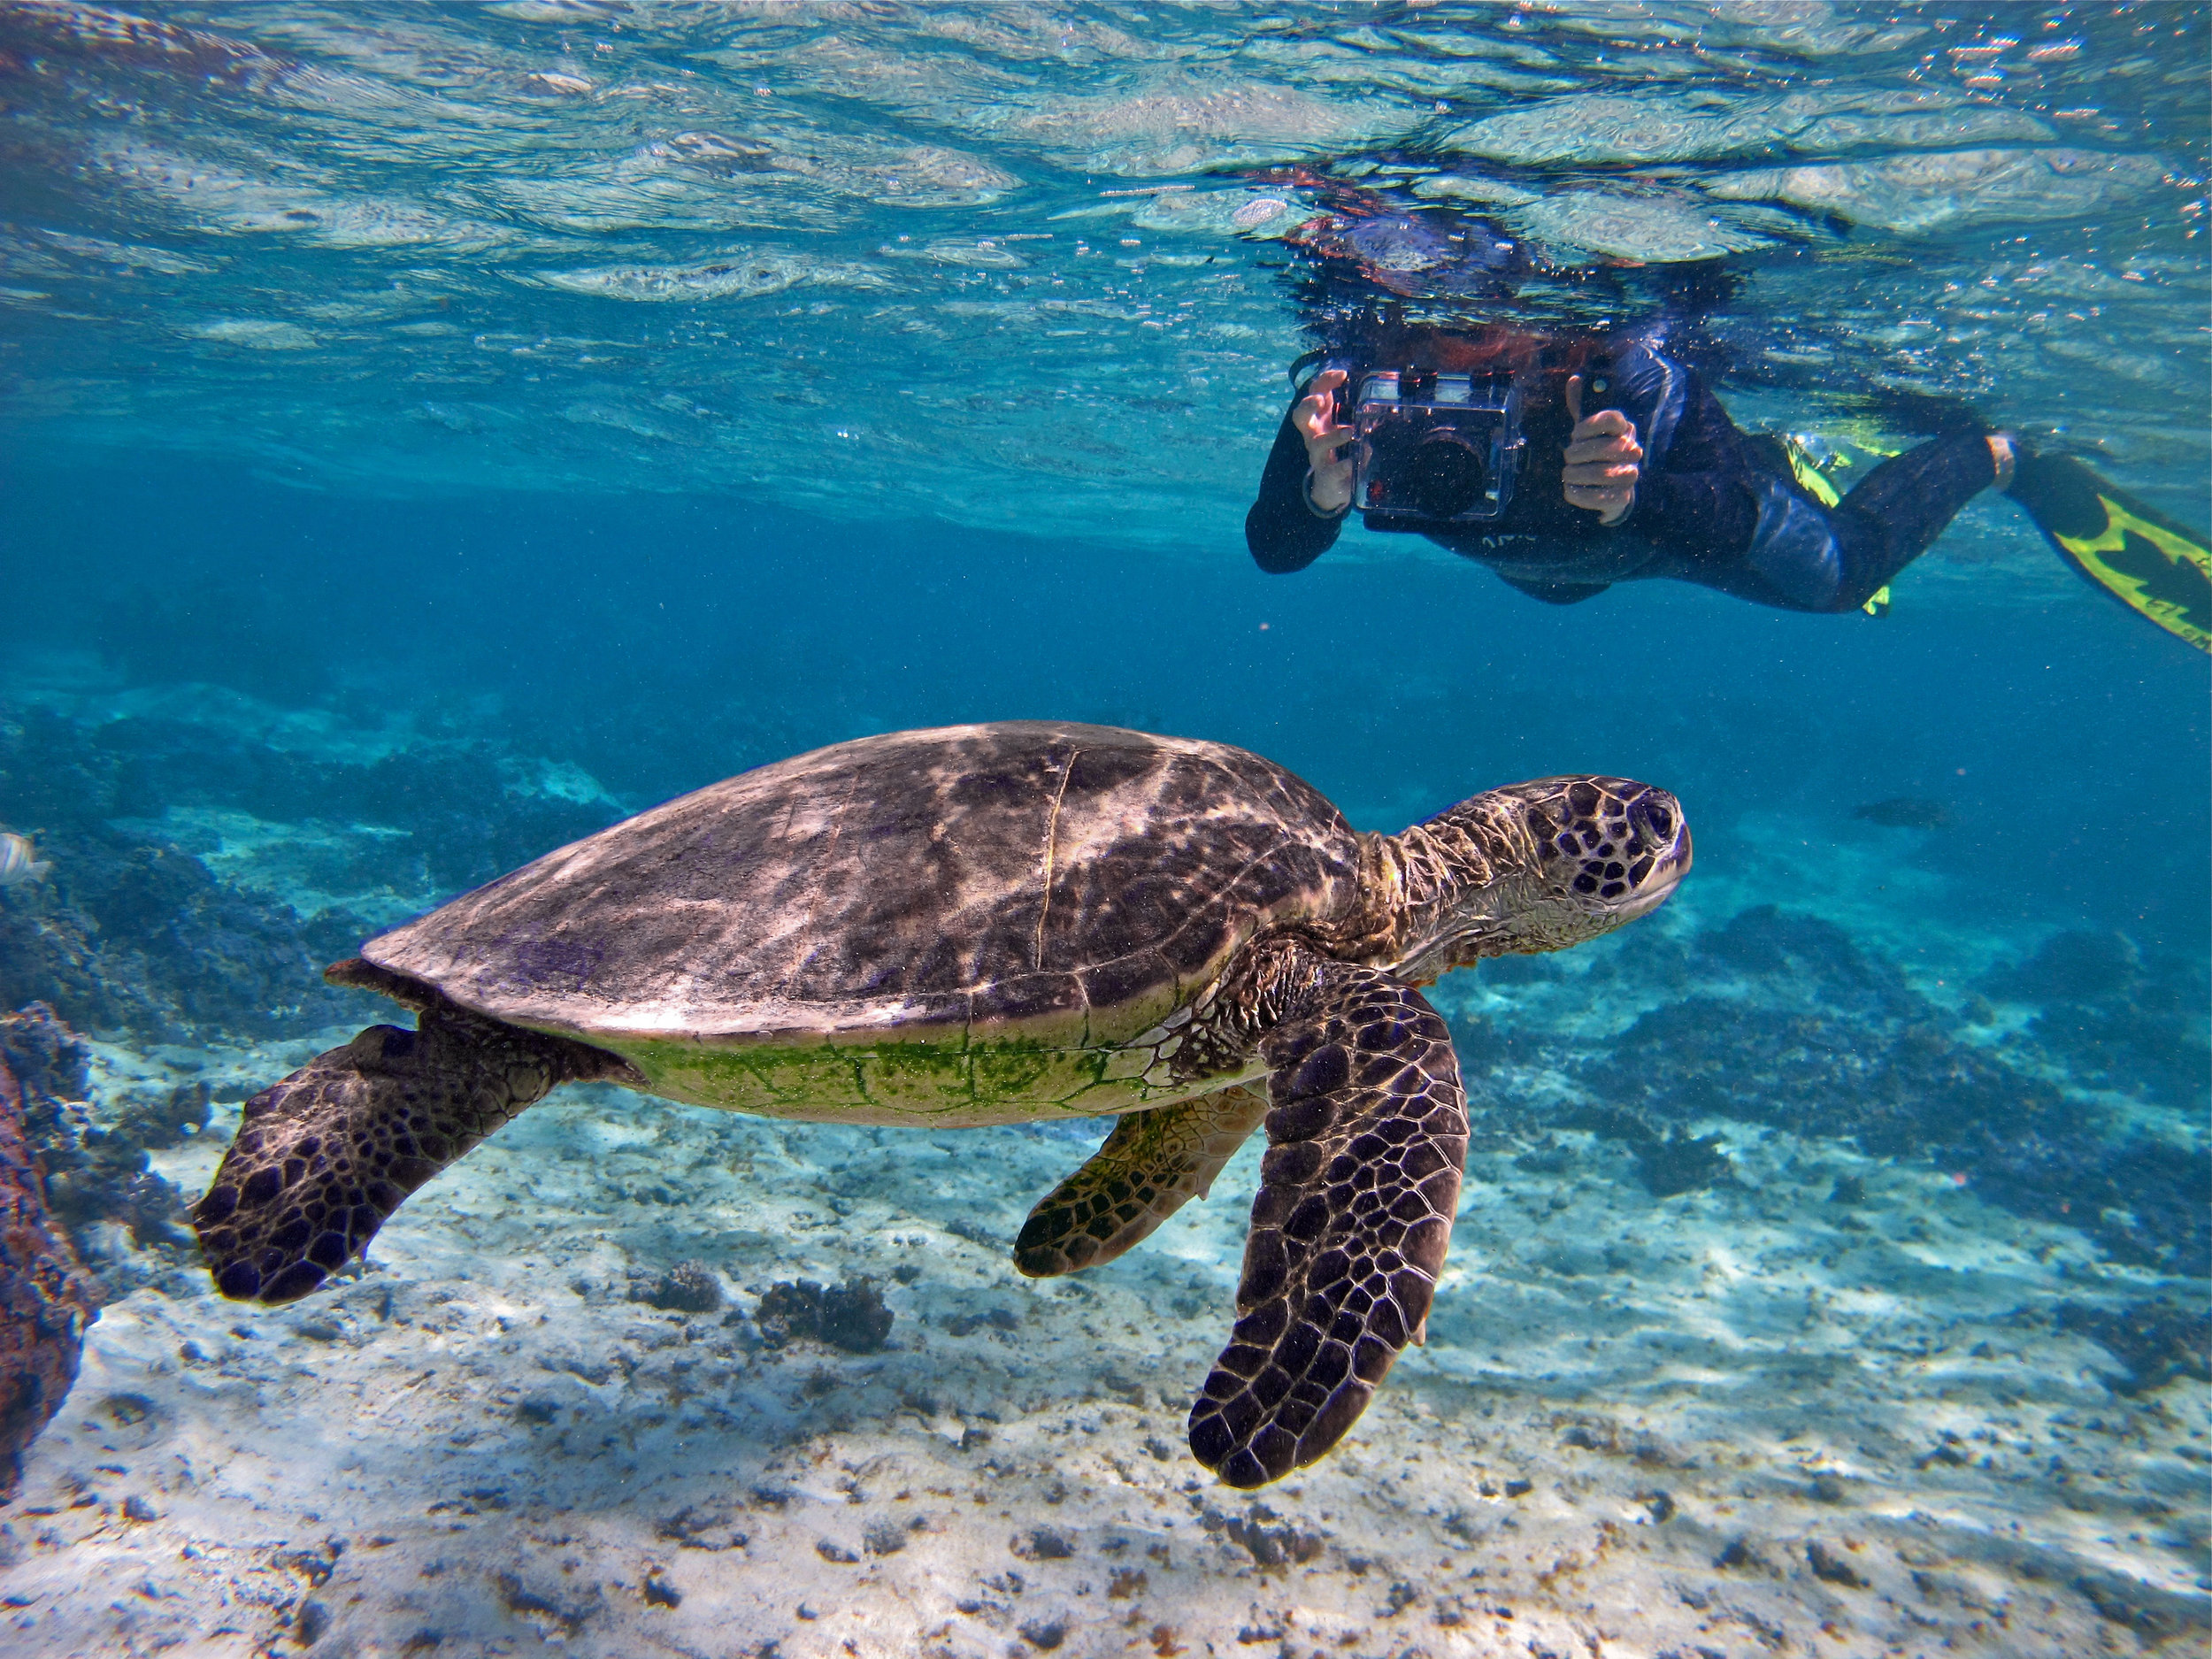 green-turtle-snorkeler-©Wayne-Sentman.jpg